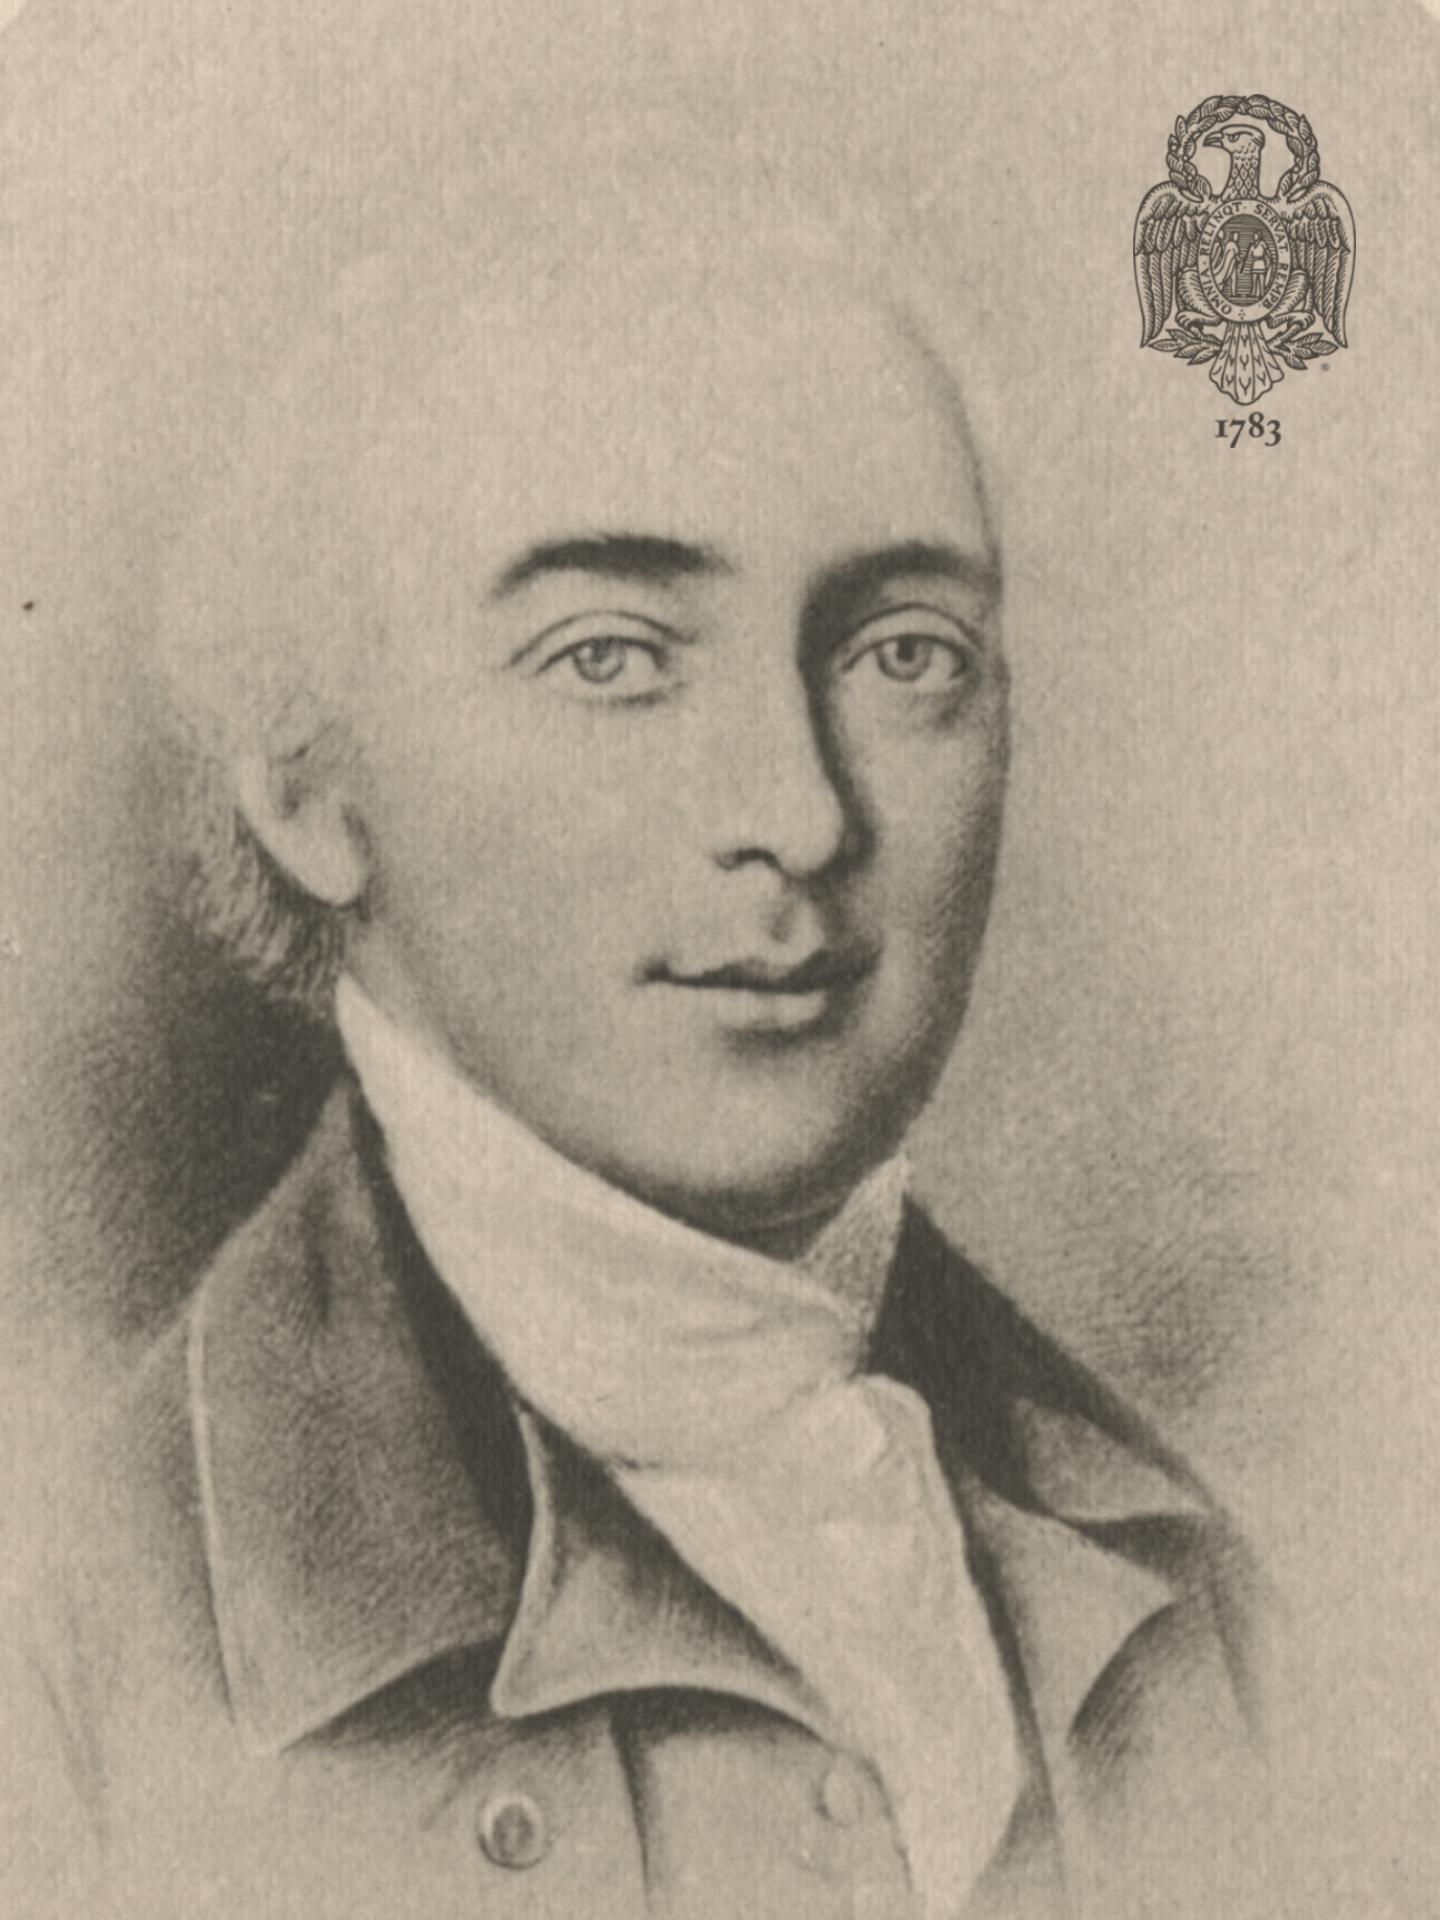 Lt. Col. Francis Nichols